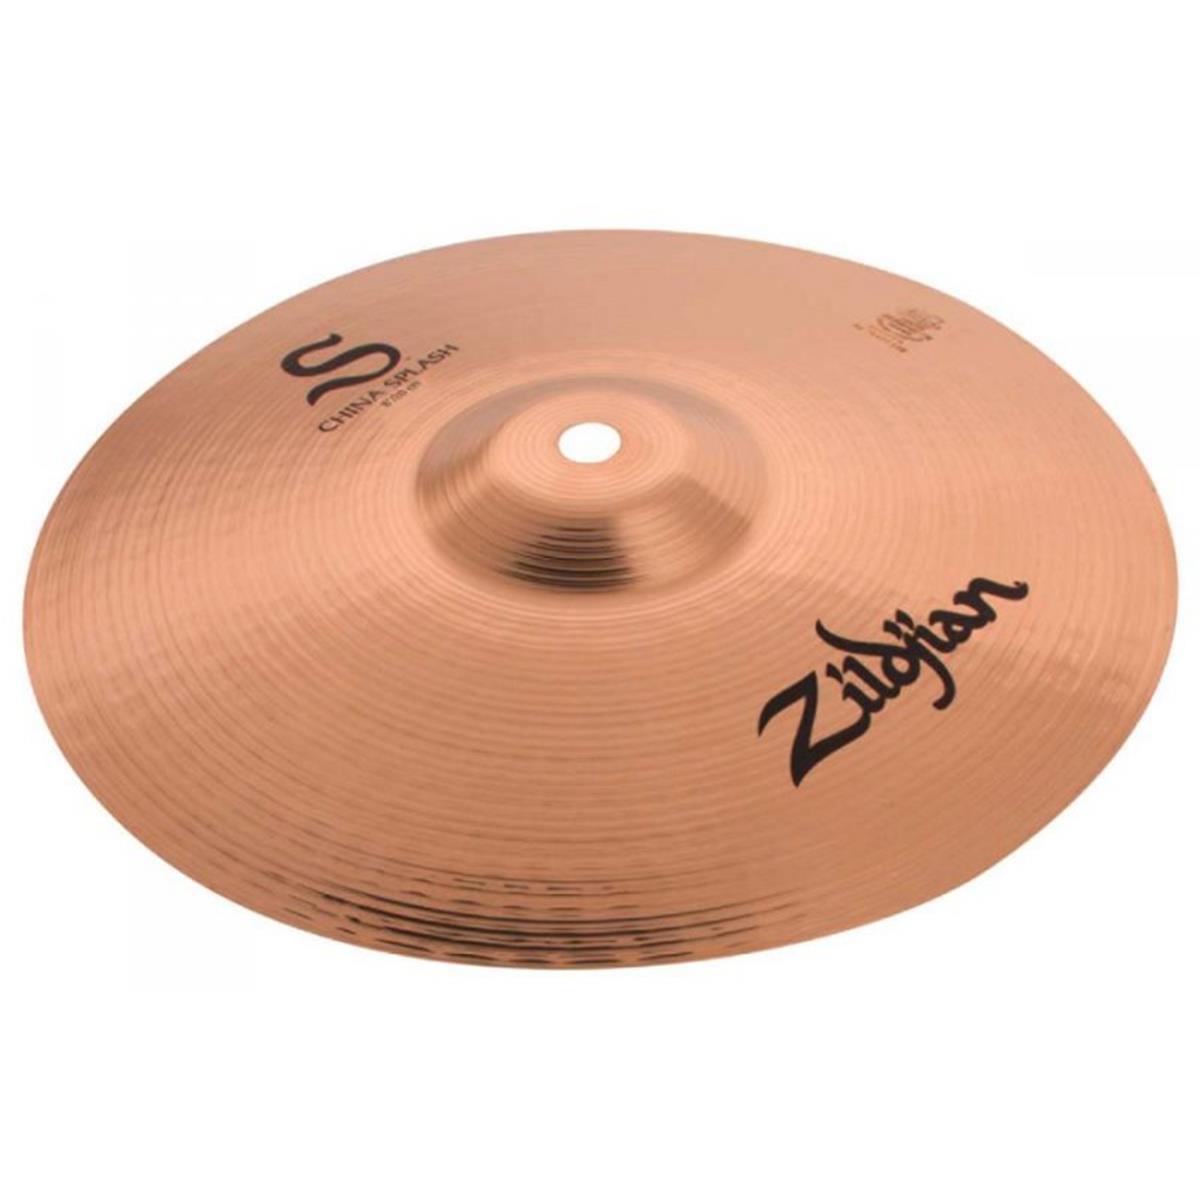 Zildjian 8 S China Splash (cm. 20) - Batterie / Percussioni Piatti - China e Altri